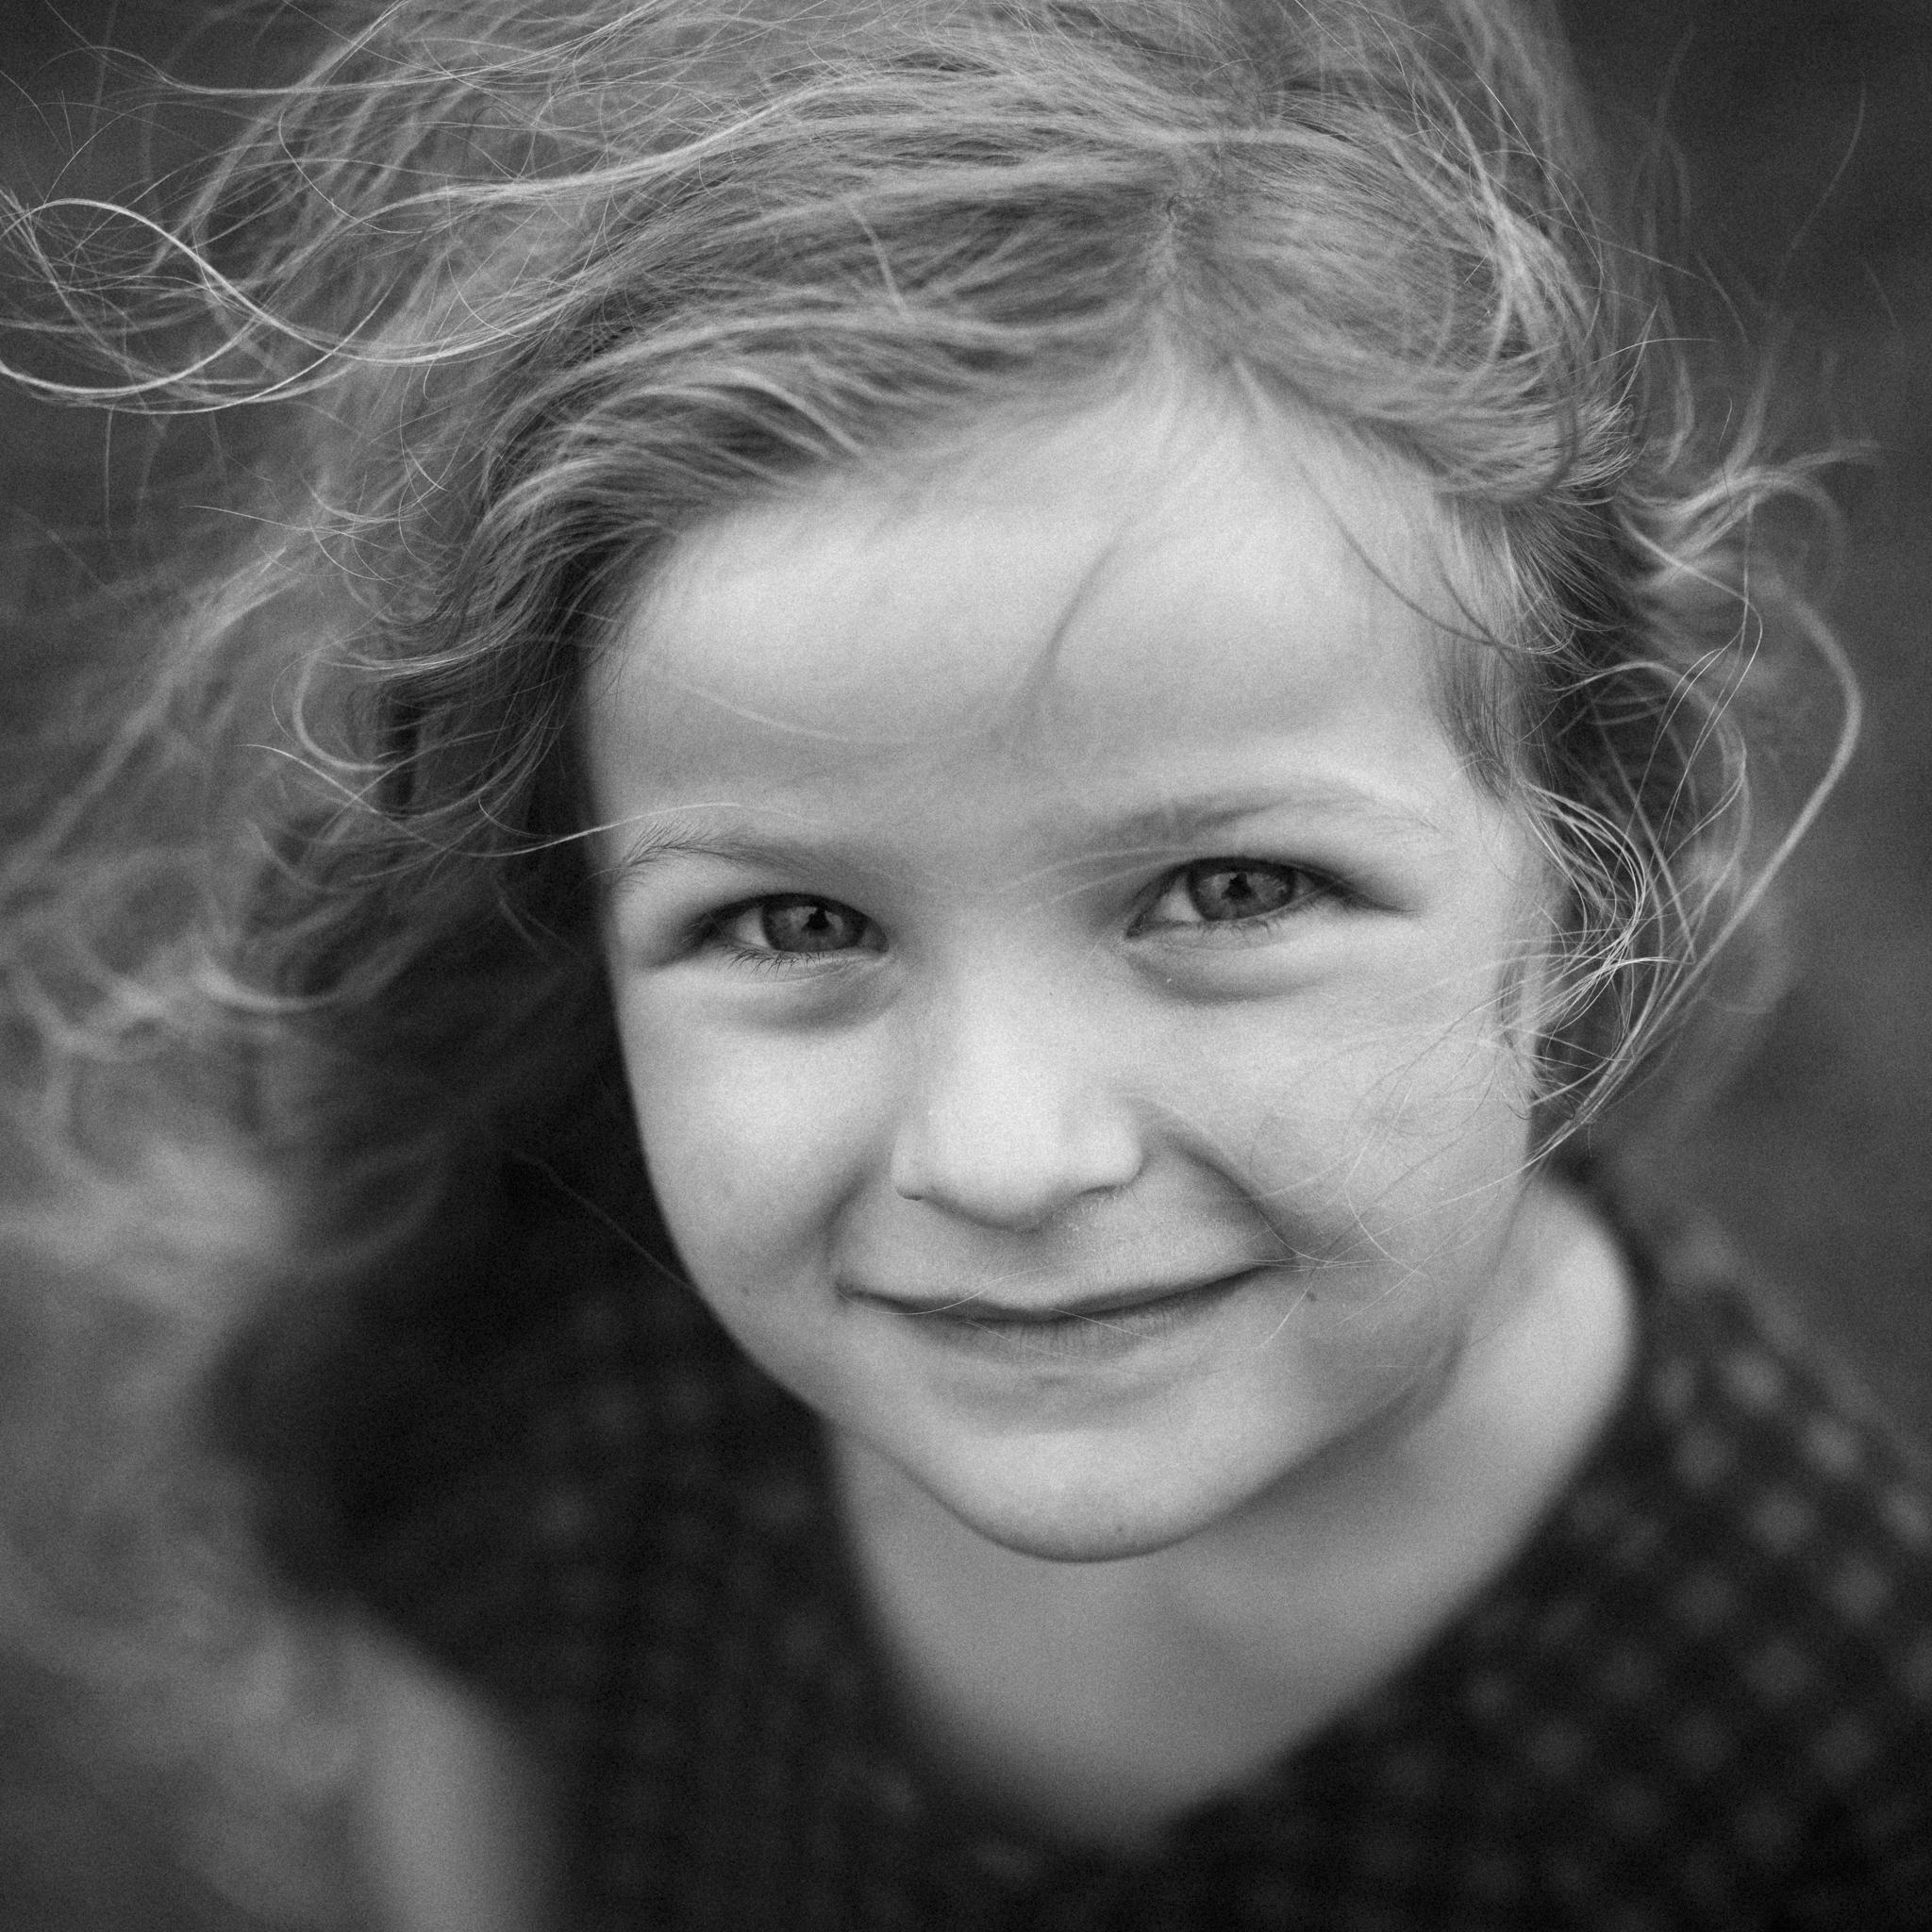 LILY BROSHA - SOUL SISTER / PIANO GIRL / HAPPY POWER